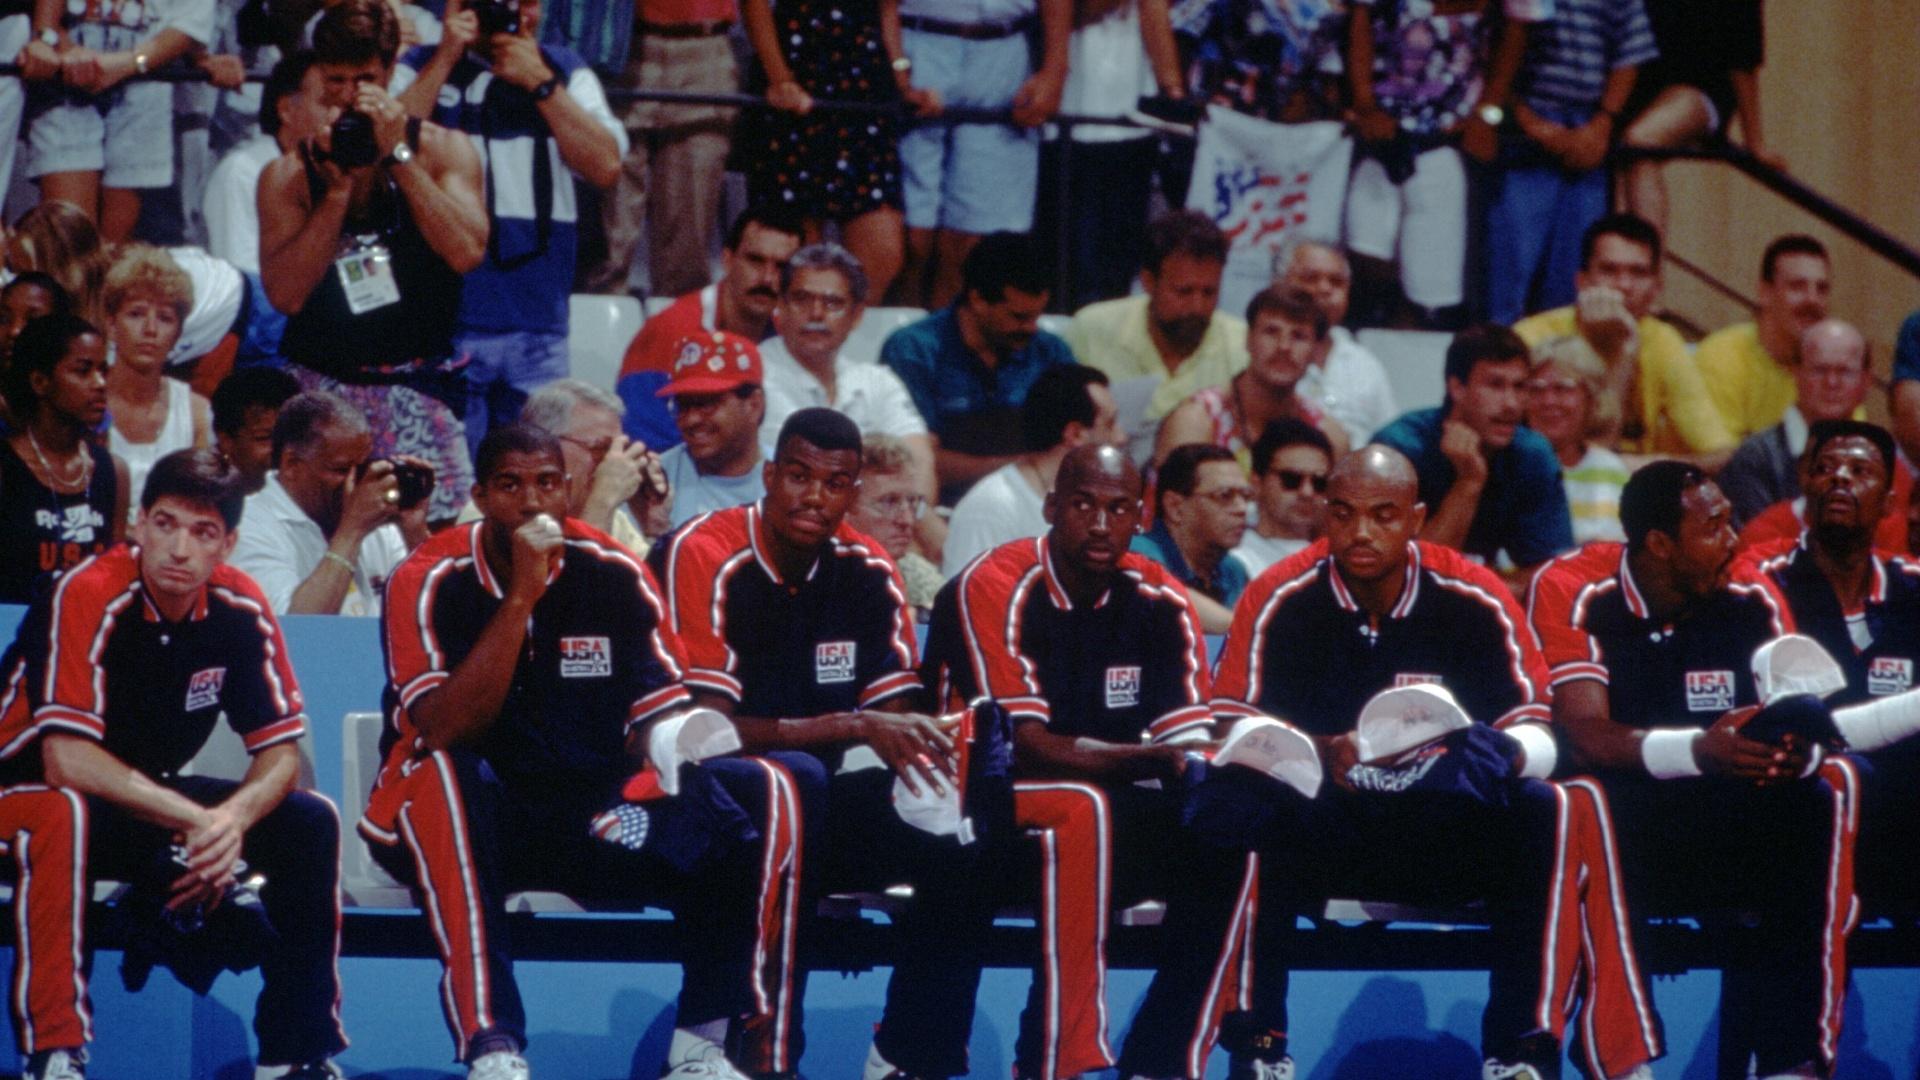 Da esquerda para a direita, Stockton, Magic Johnson, David Robinson, Michael Jordan, Charles Barkley, Karl Malone e Patrick Ewing